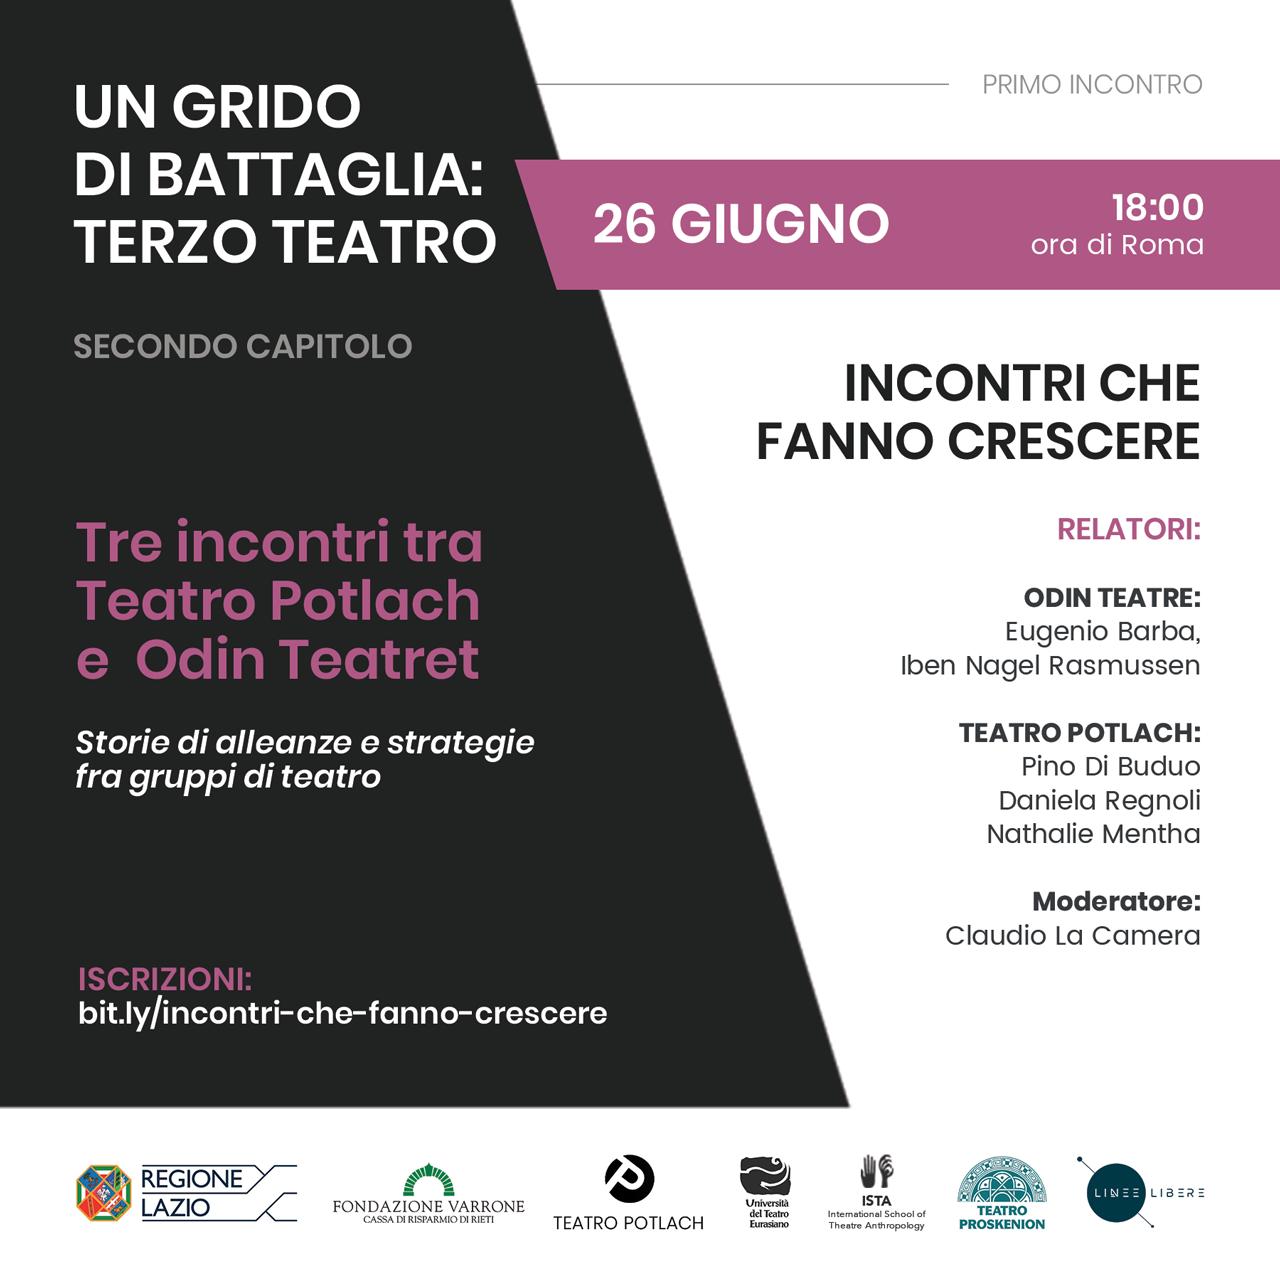 Iben Nagel Rasmussen live streaming with Teatro Potlach